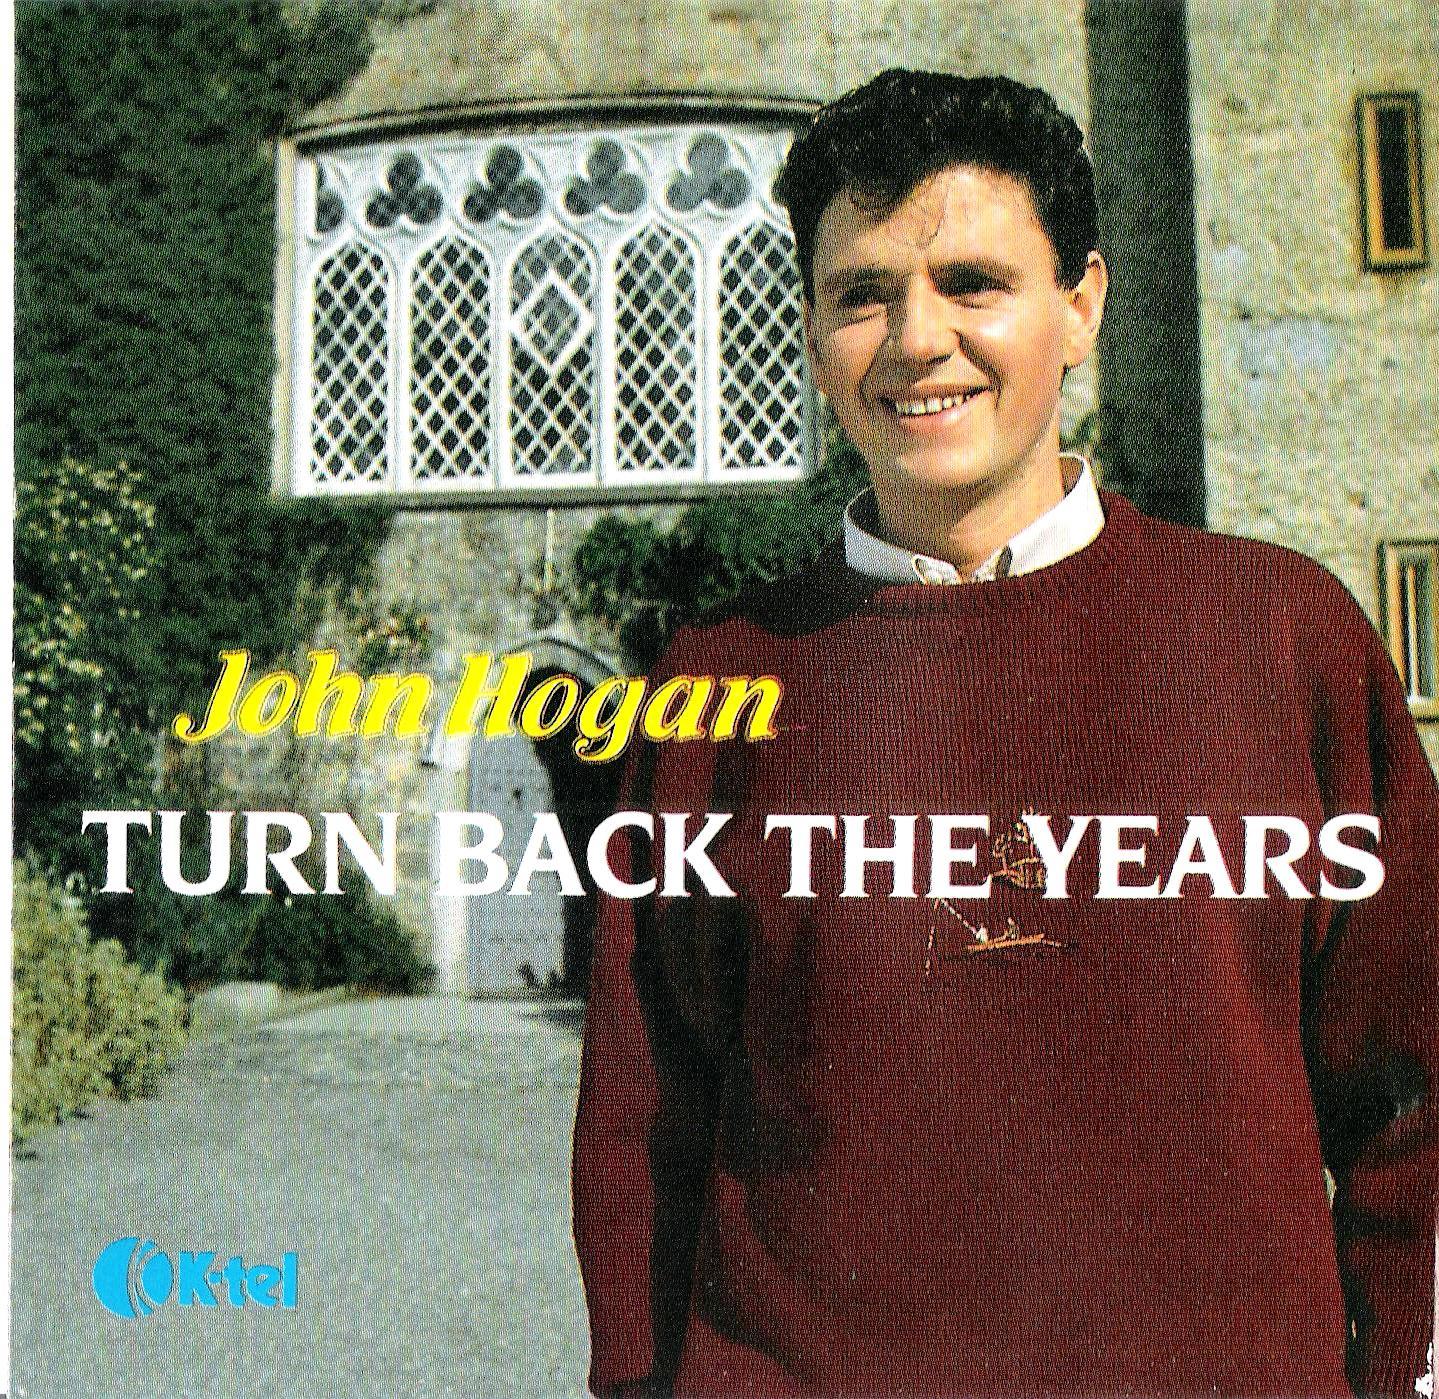 el Rancho: Turn Back The Years - John Hogan (1989)